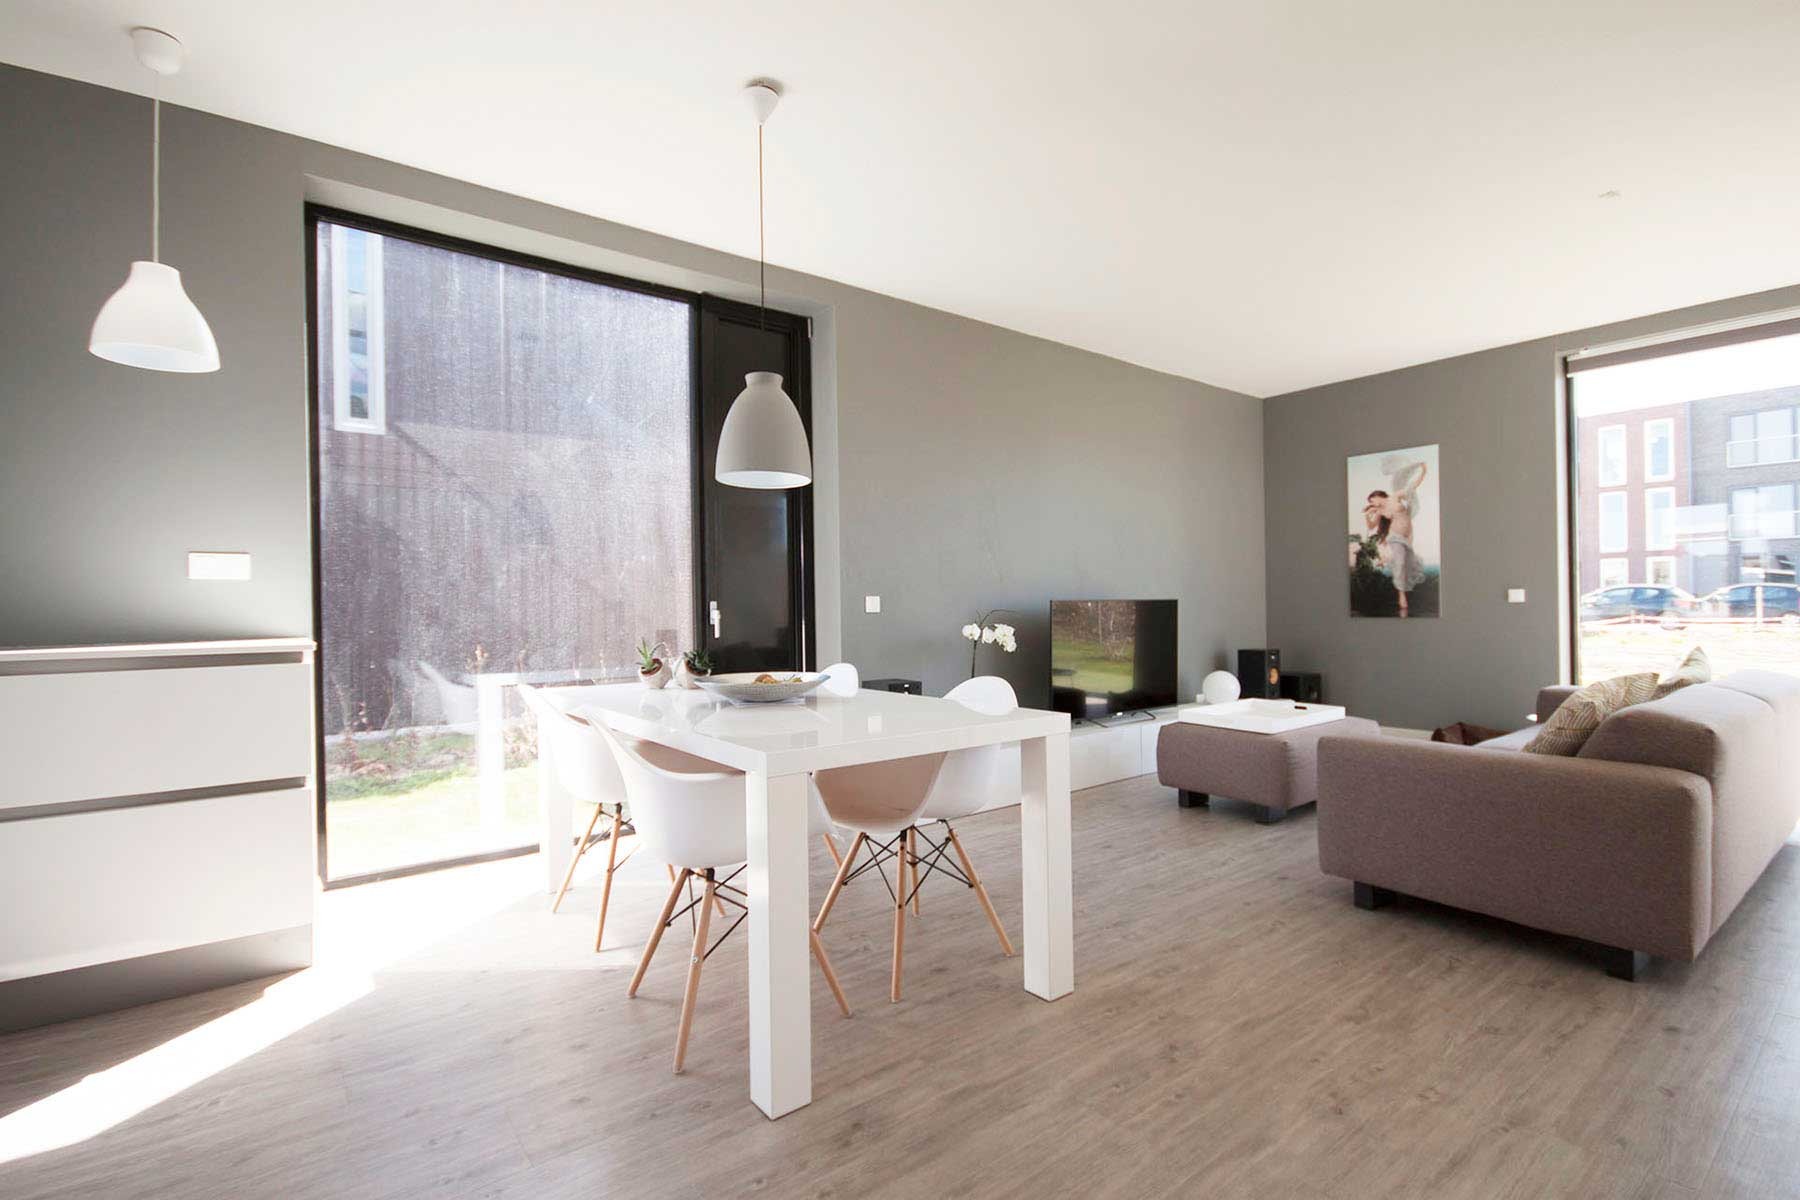 8A-Architecten-datcha-house-2-Lent-06